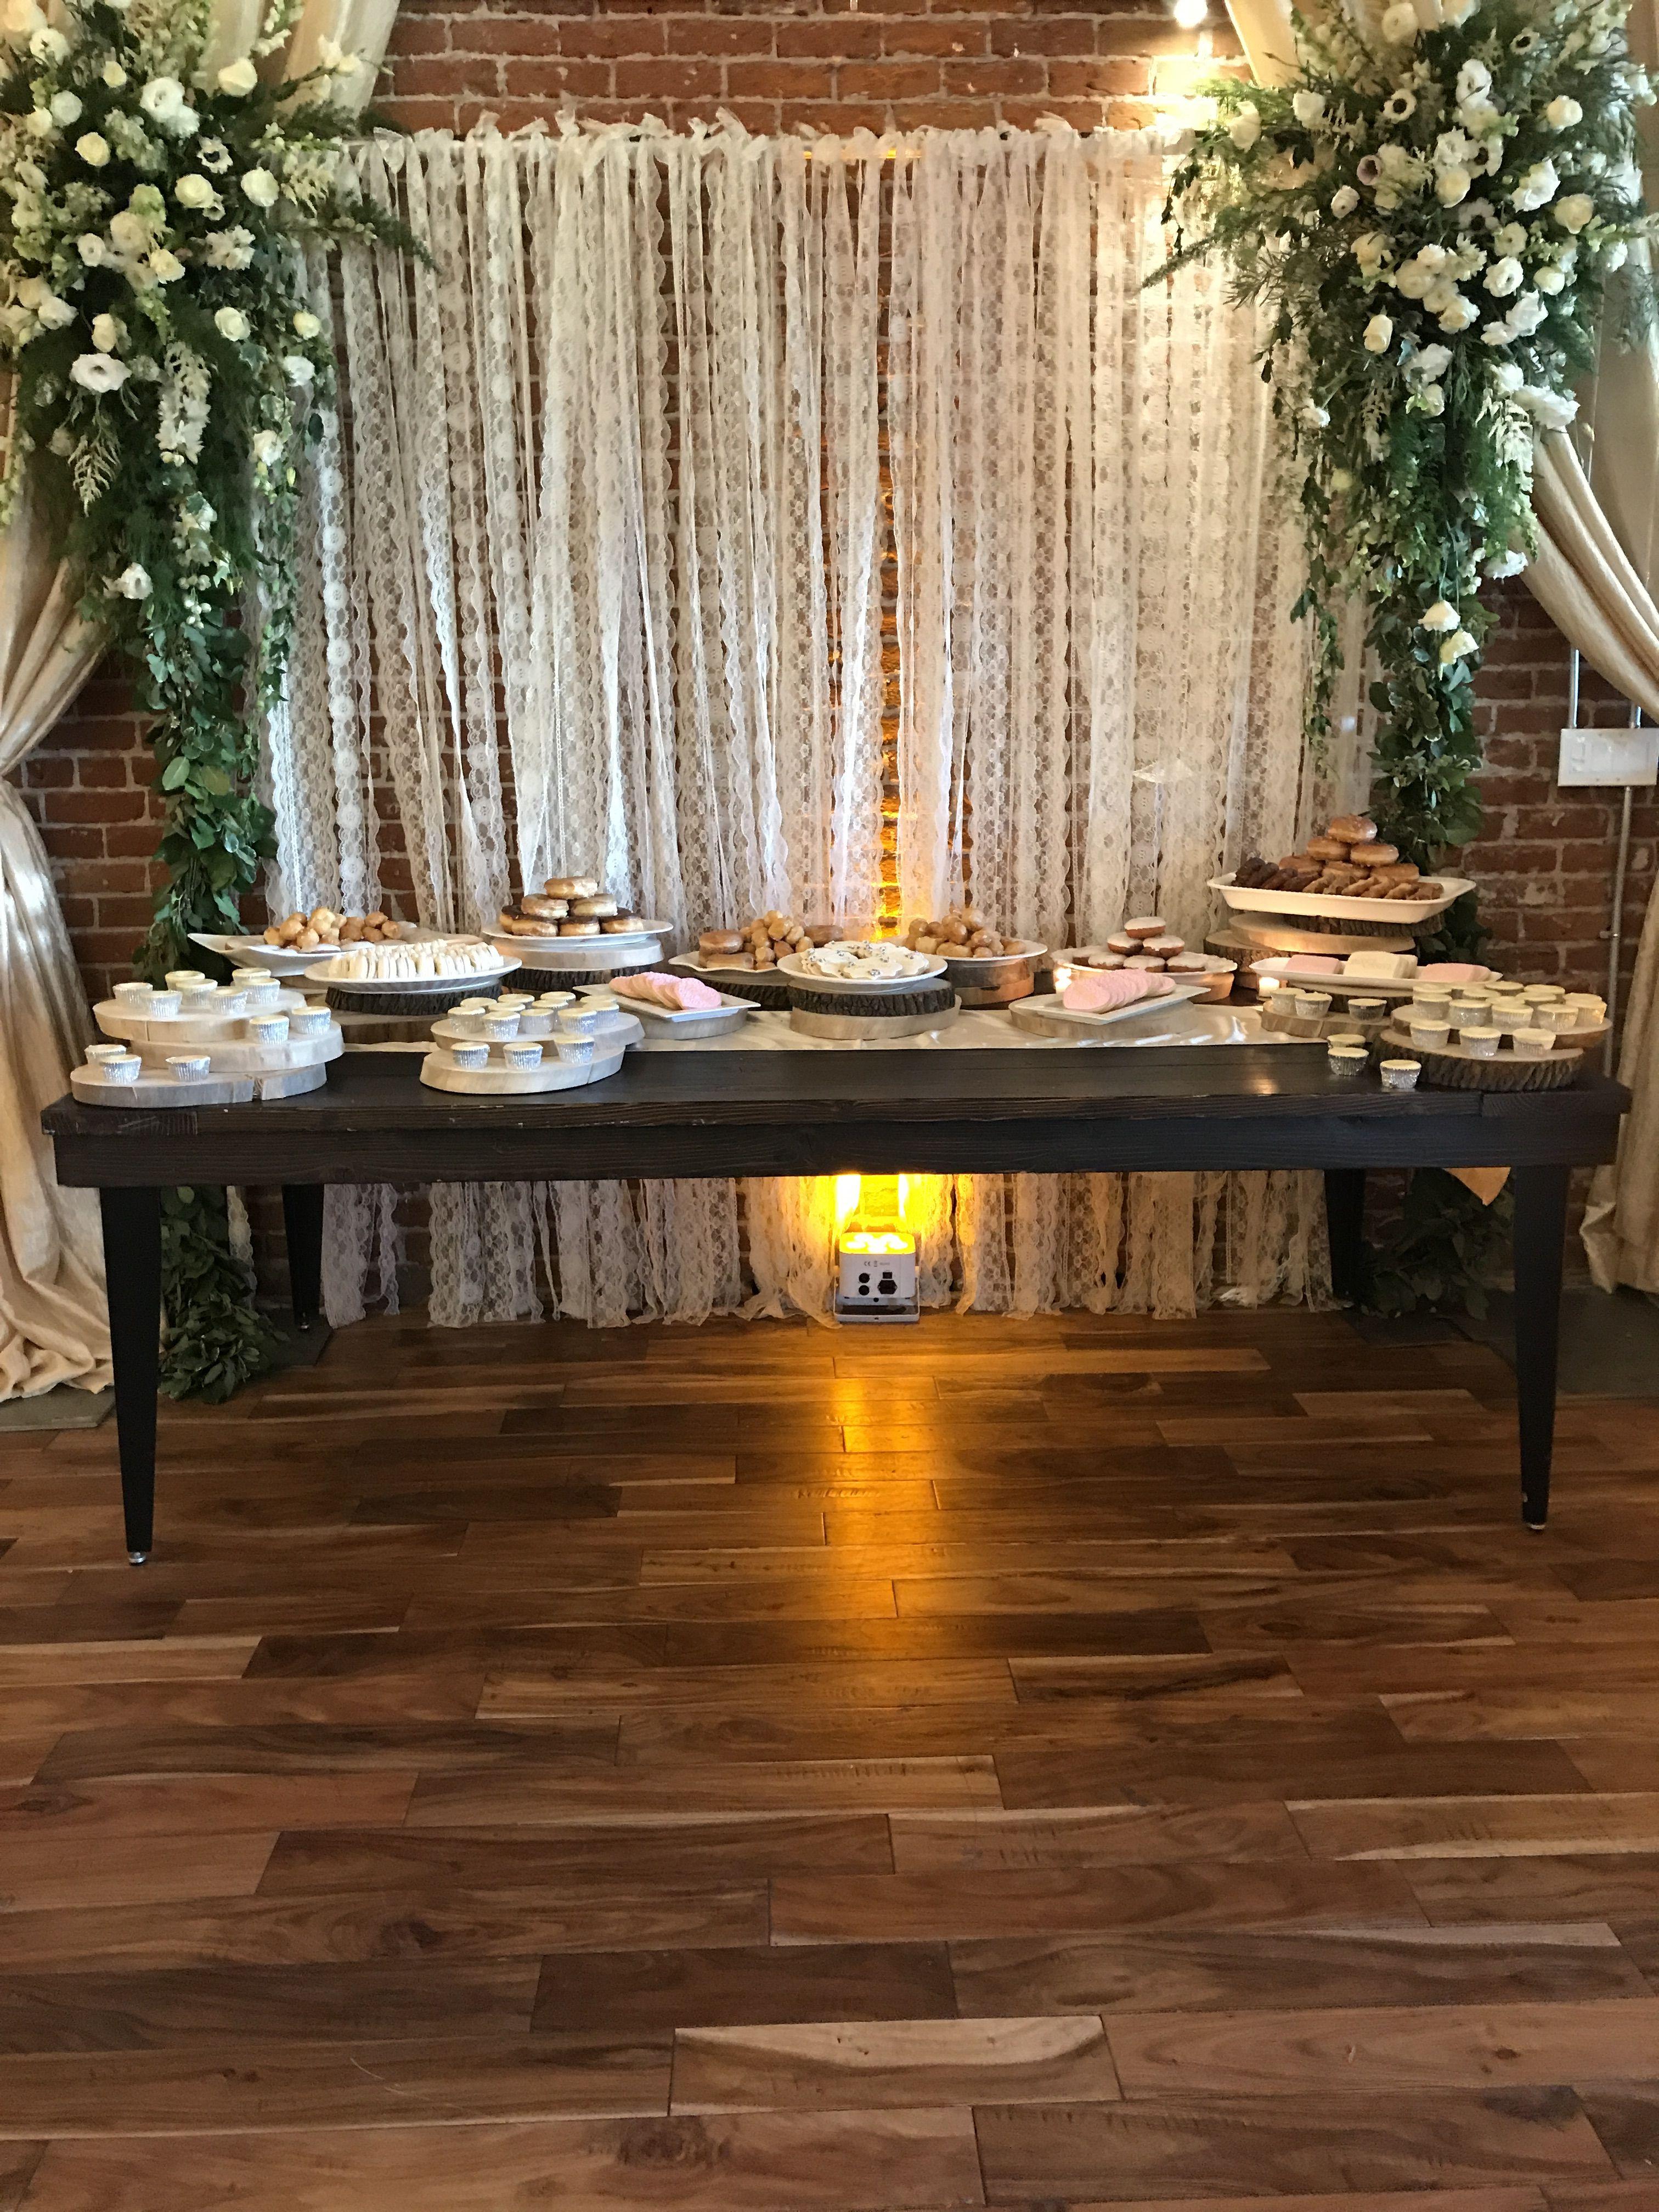 Dessert Table Greenery Garland Amber Uplight Wedding Held At The Century Modesto Ca Wedding Urban Chic Chic Wedding Venues Sweetheart Table